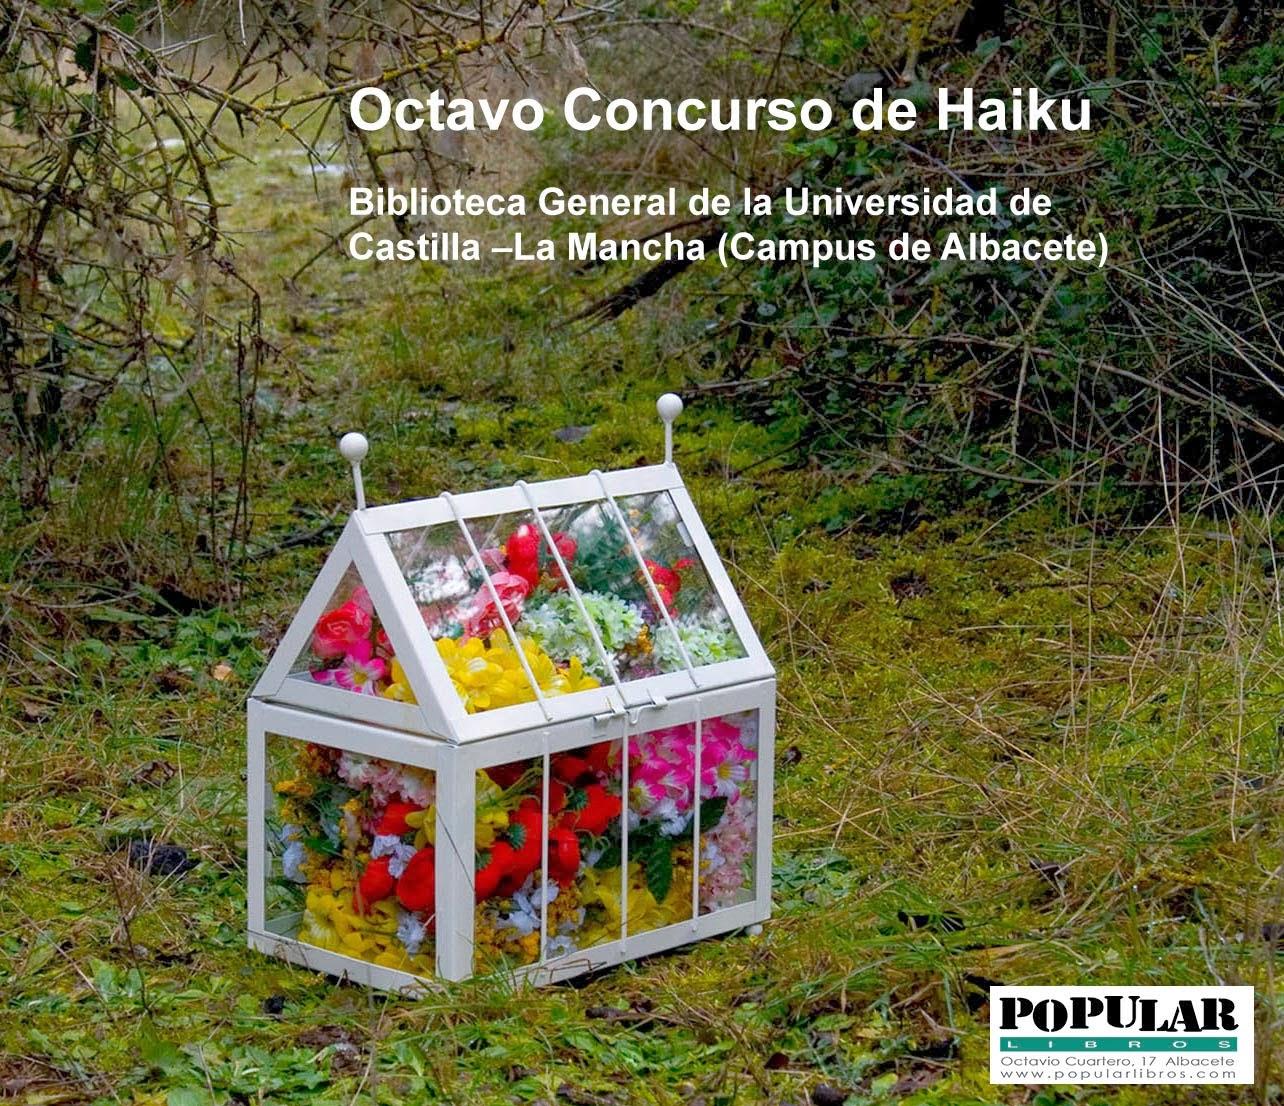 Octavo Concurso de Haiku 2014